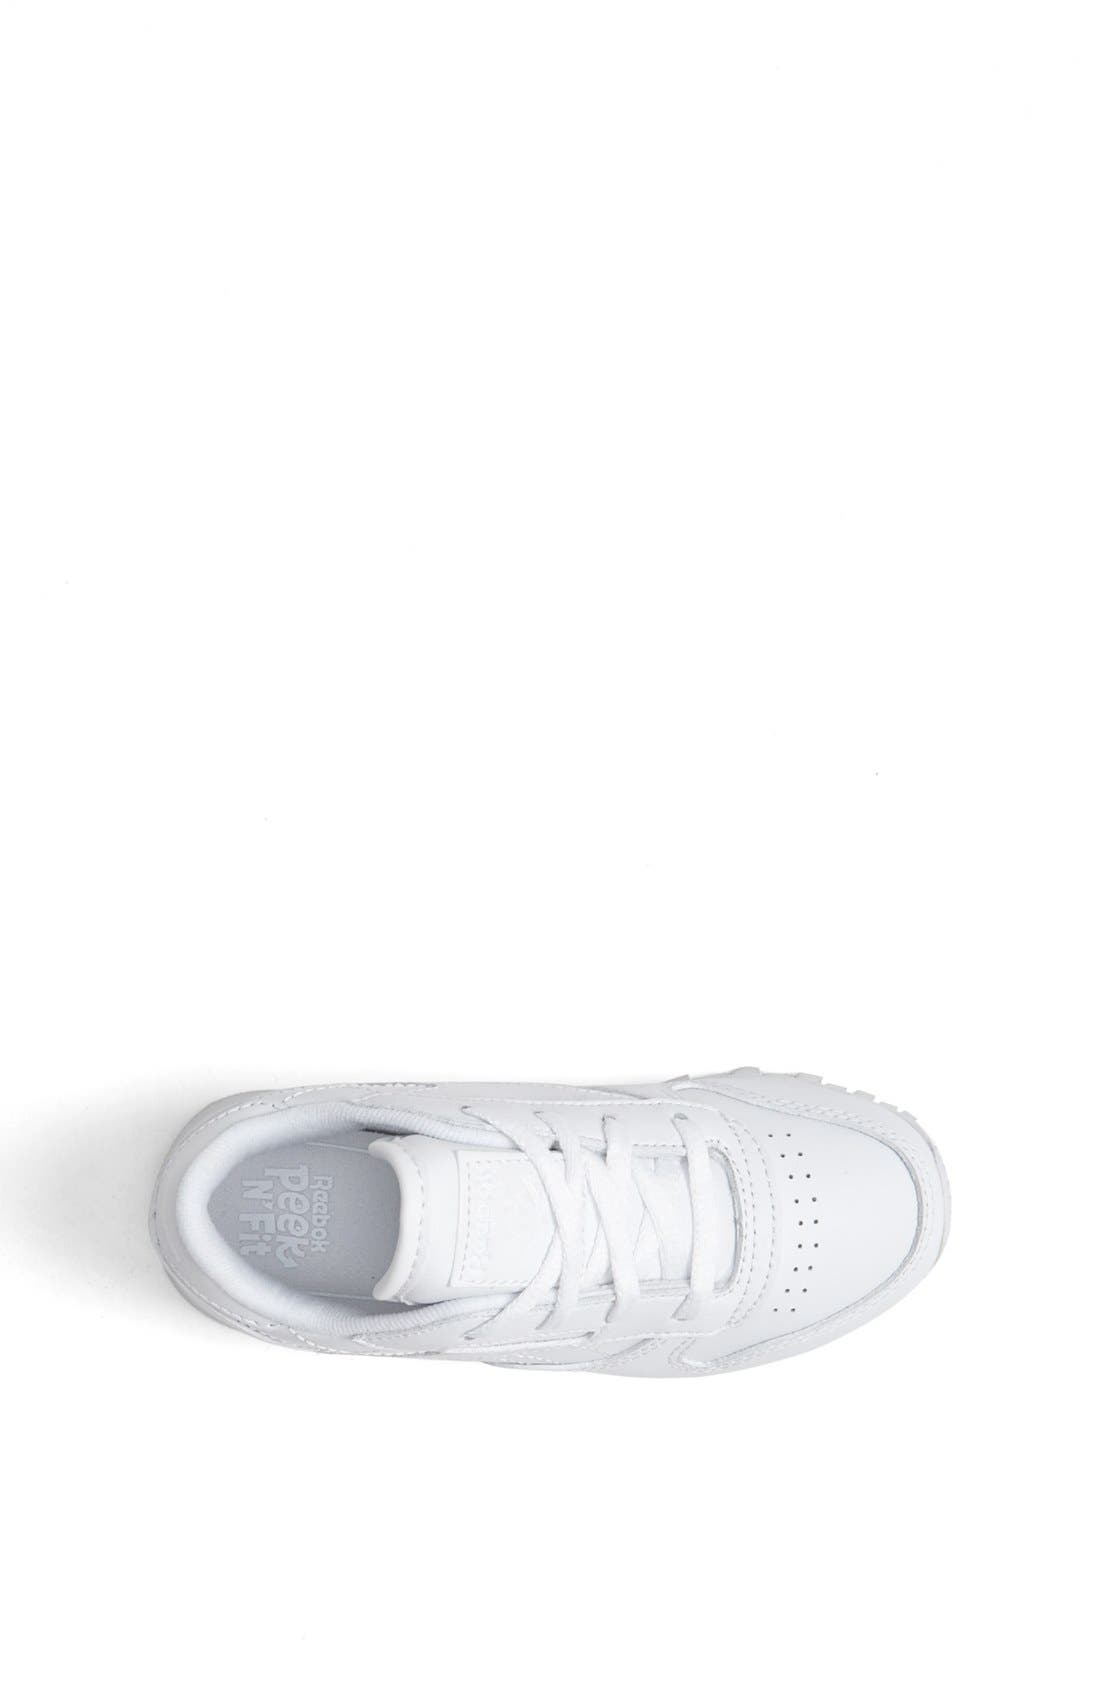 Alternate Image 3  - Reebok 'Classic' Leather Sneaker (Baby, Walker & Toddler)